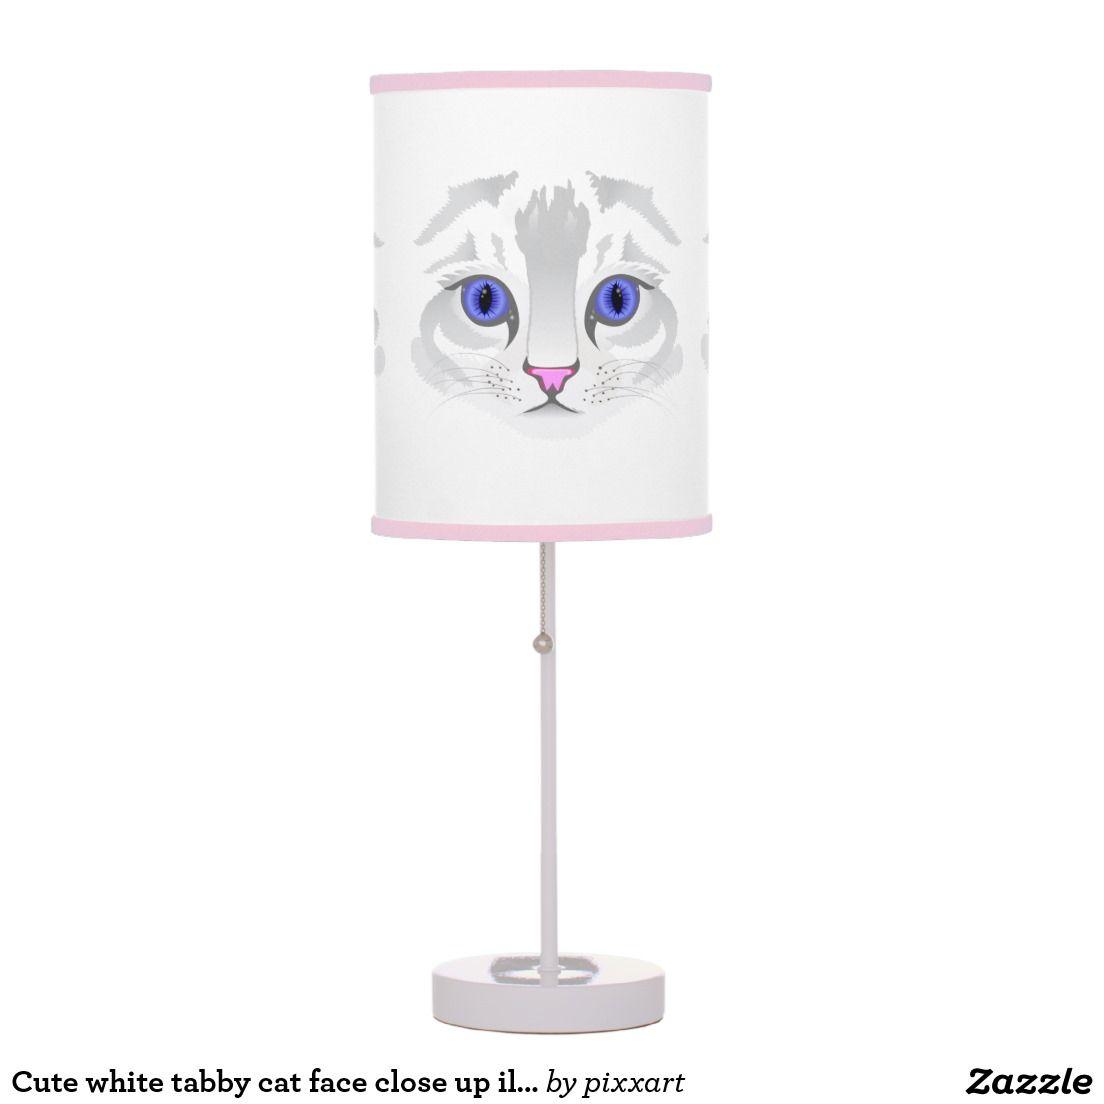 Cute white tabby cat face close up illustration desk lamp white